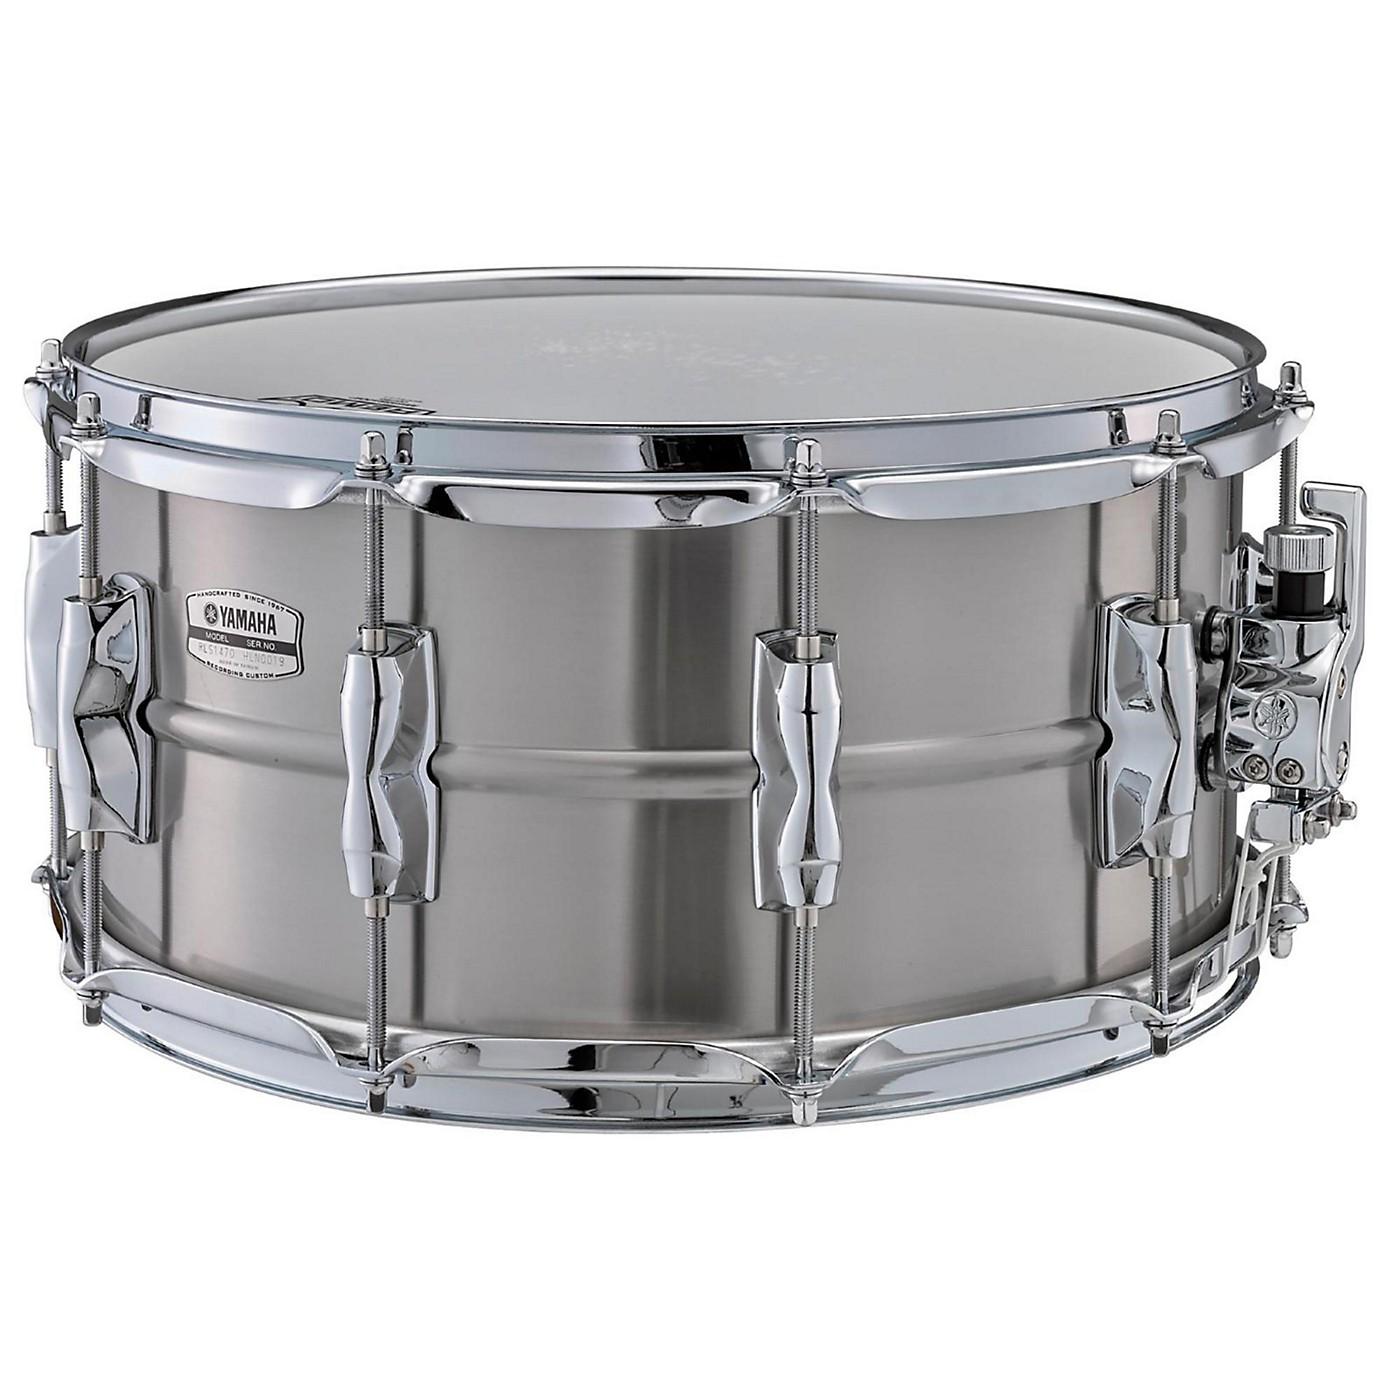 Yamaha Recording Custom Stainless Steel Snare Drum thumbnail